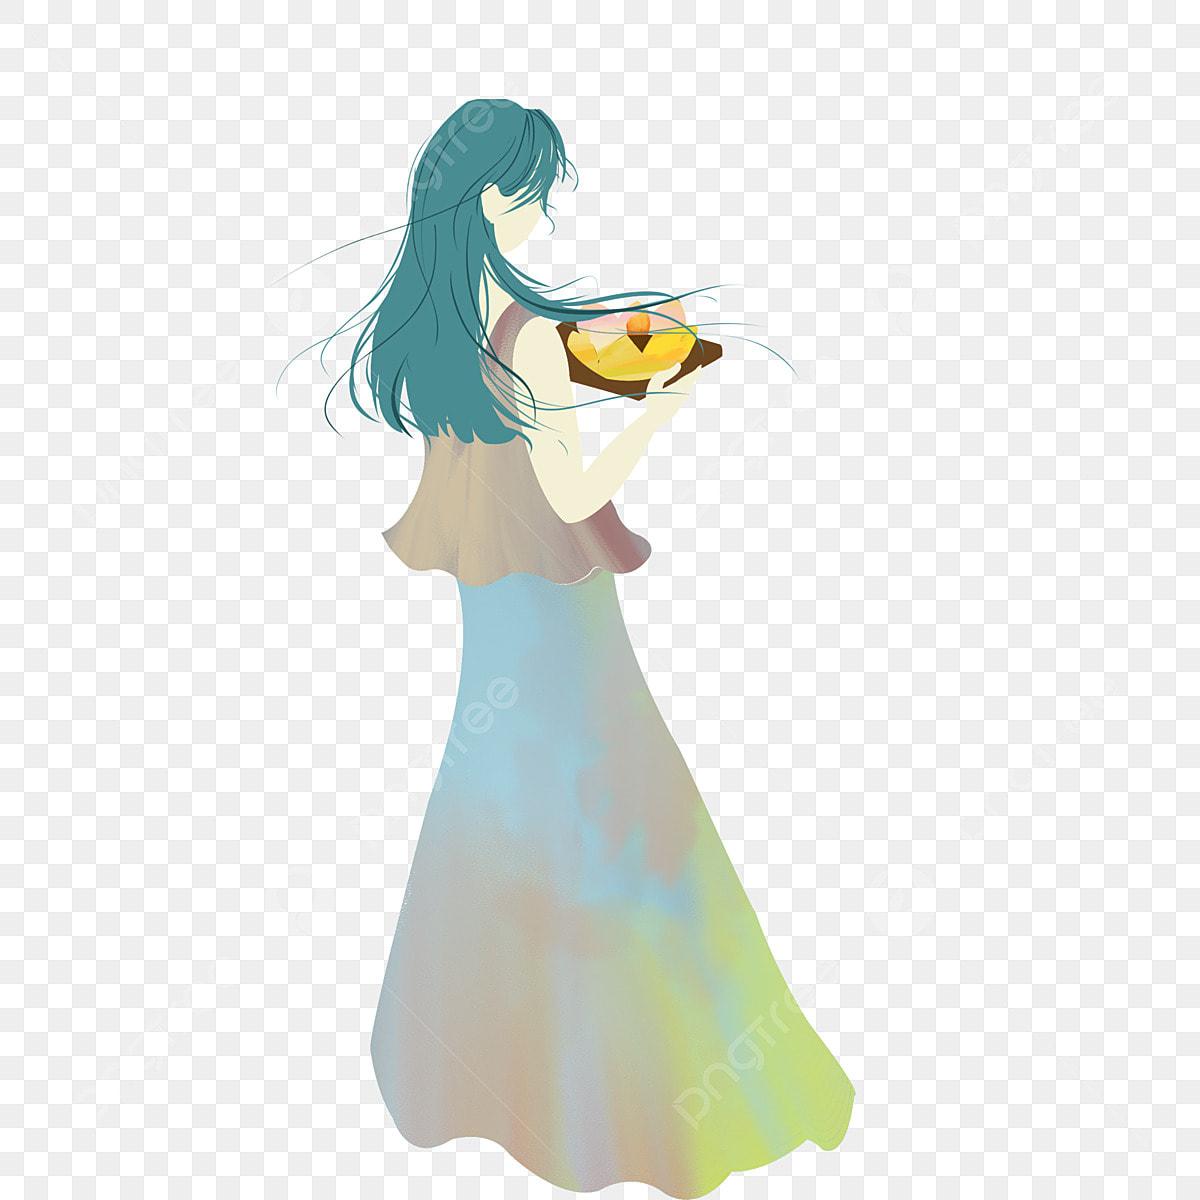 Cartoon Girl Back View Free Illustration, Anime Girl, Fashion Girl